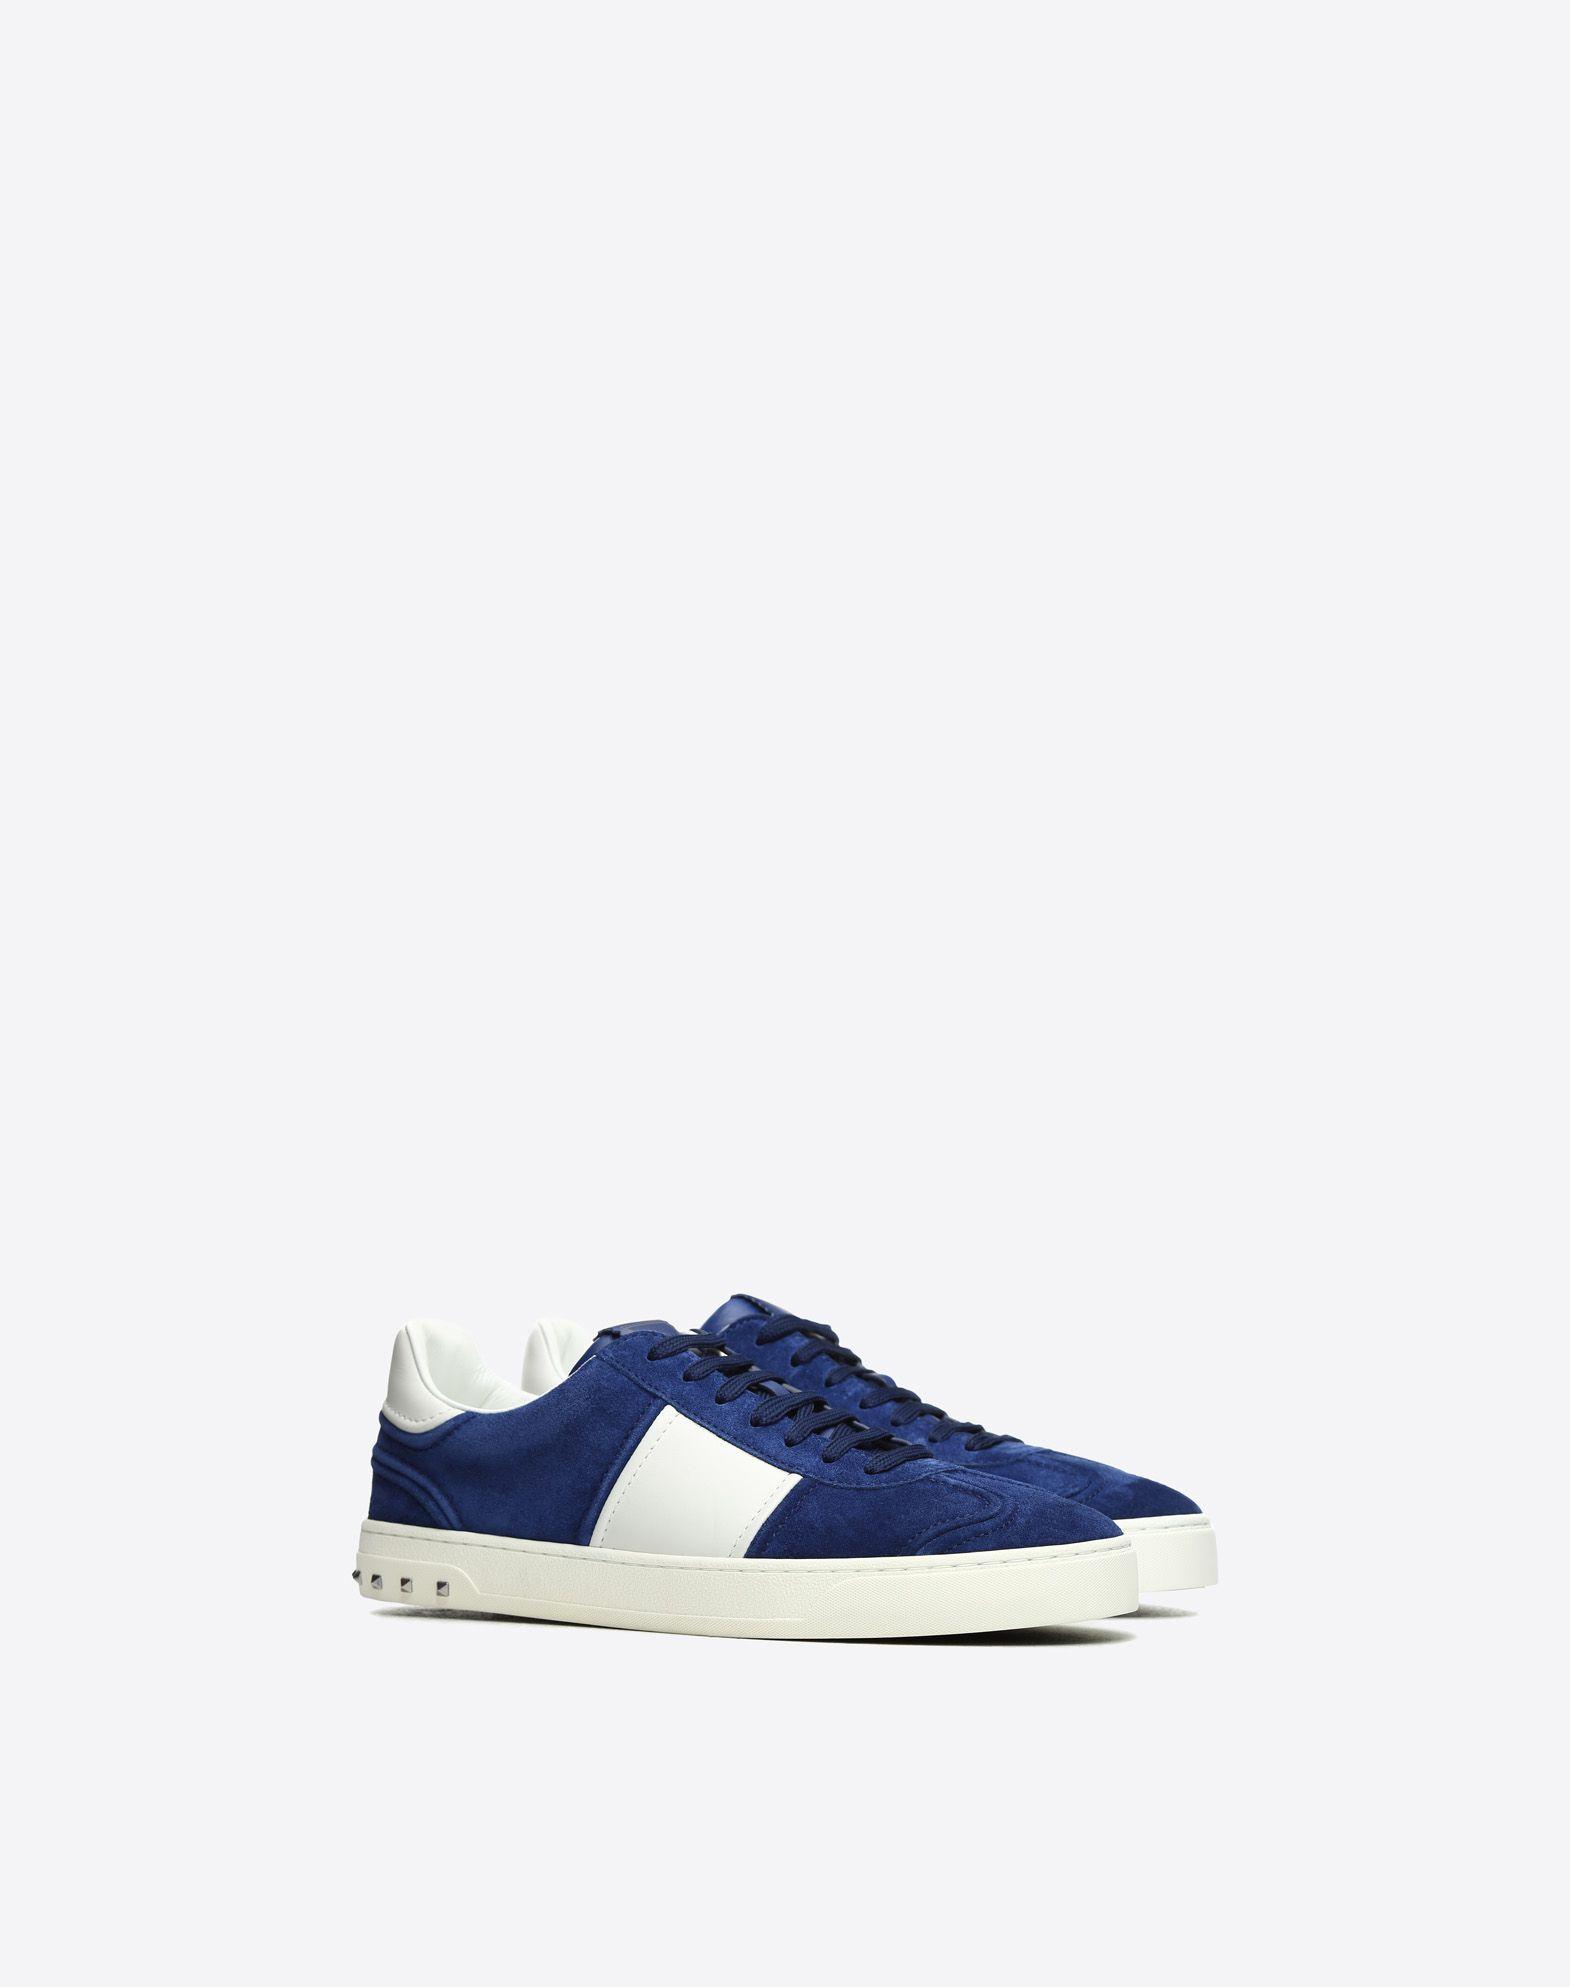 VALENTINO GARAVANI UOMO Flycrew Sneakers  LOW-TOP SNEAKERS U r